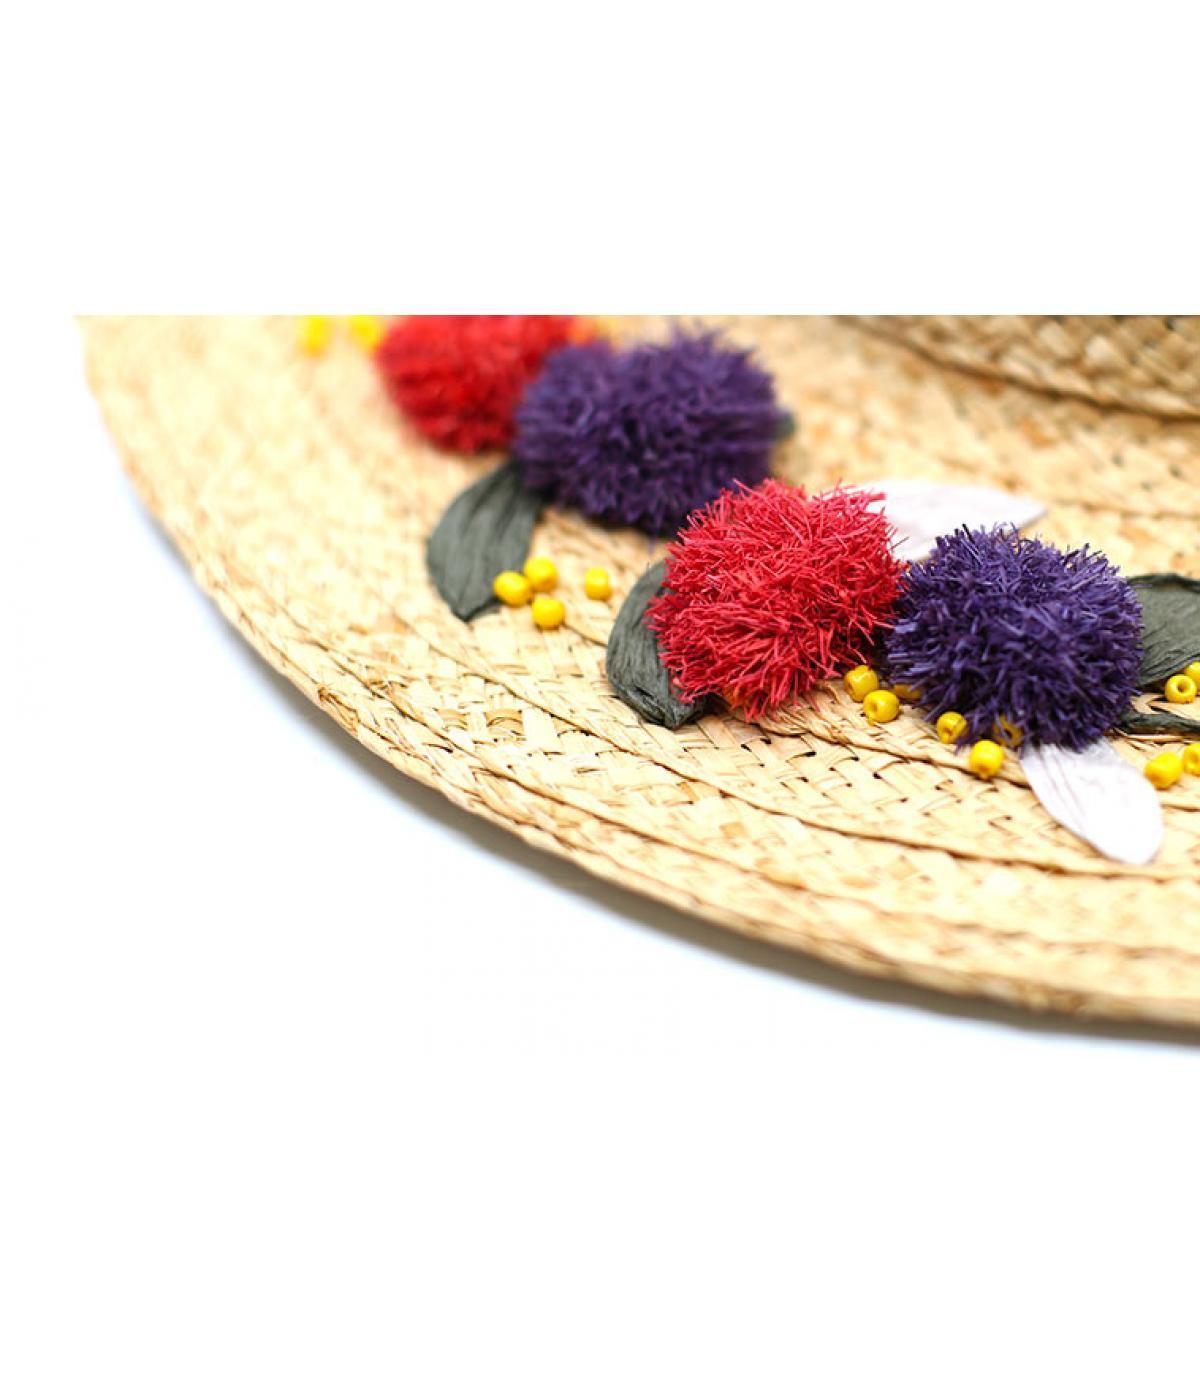 Details Floppy Raphia Flower Embroidery - Abbildung 4